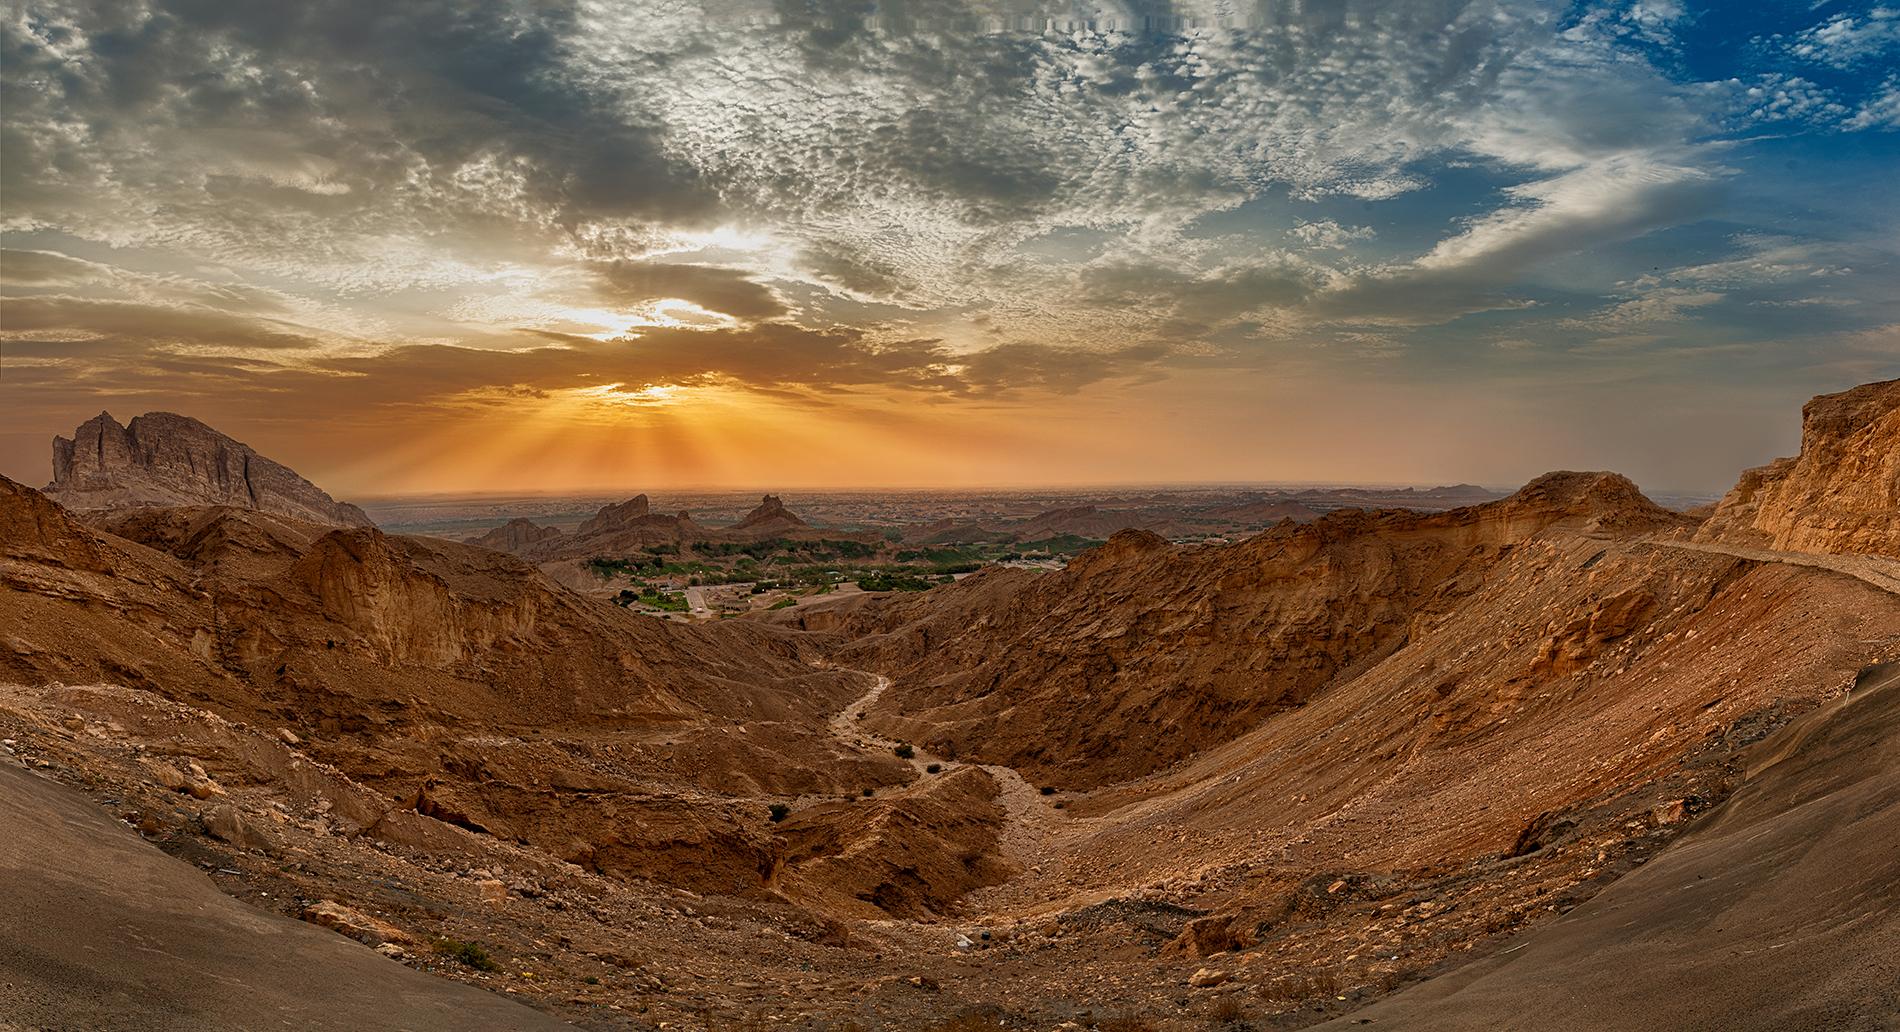 Beautiful Mountain range of Al Ain, The Jabel Hafeet.